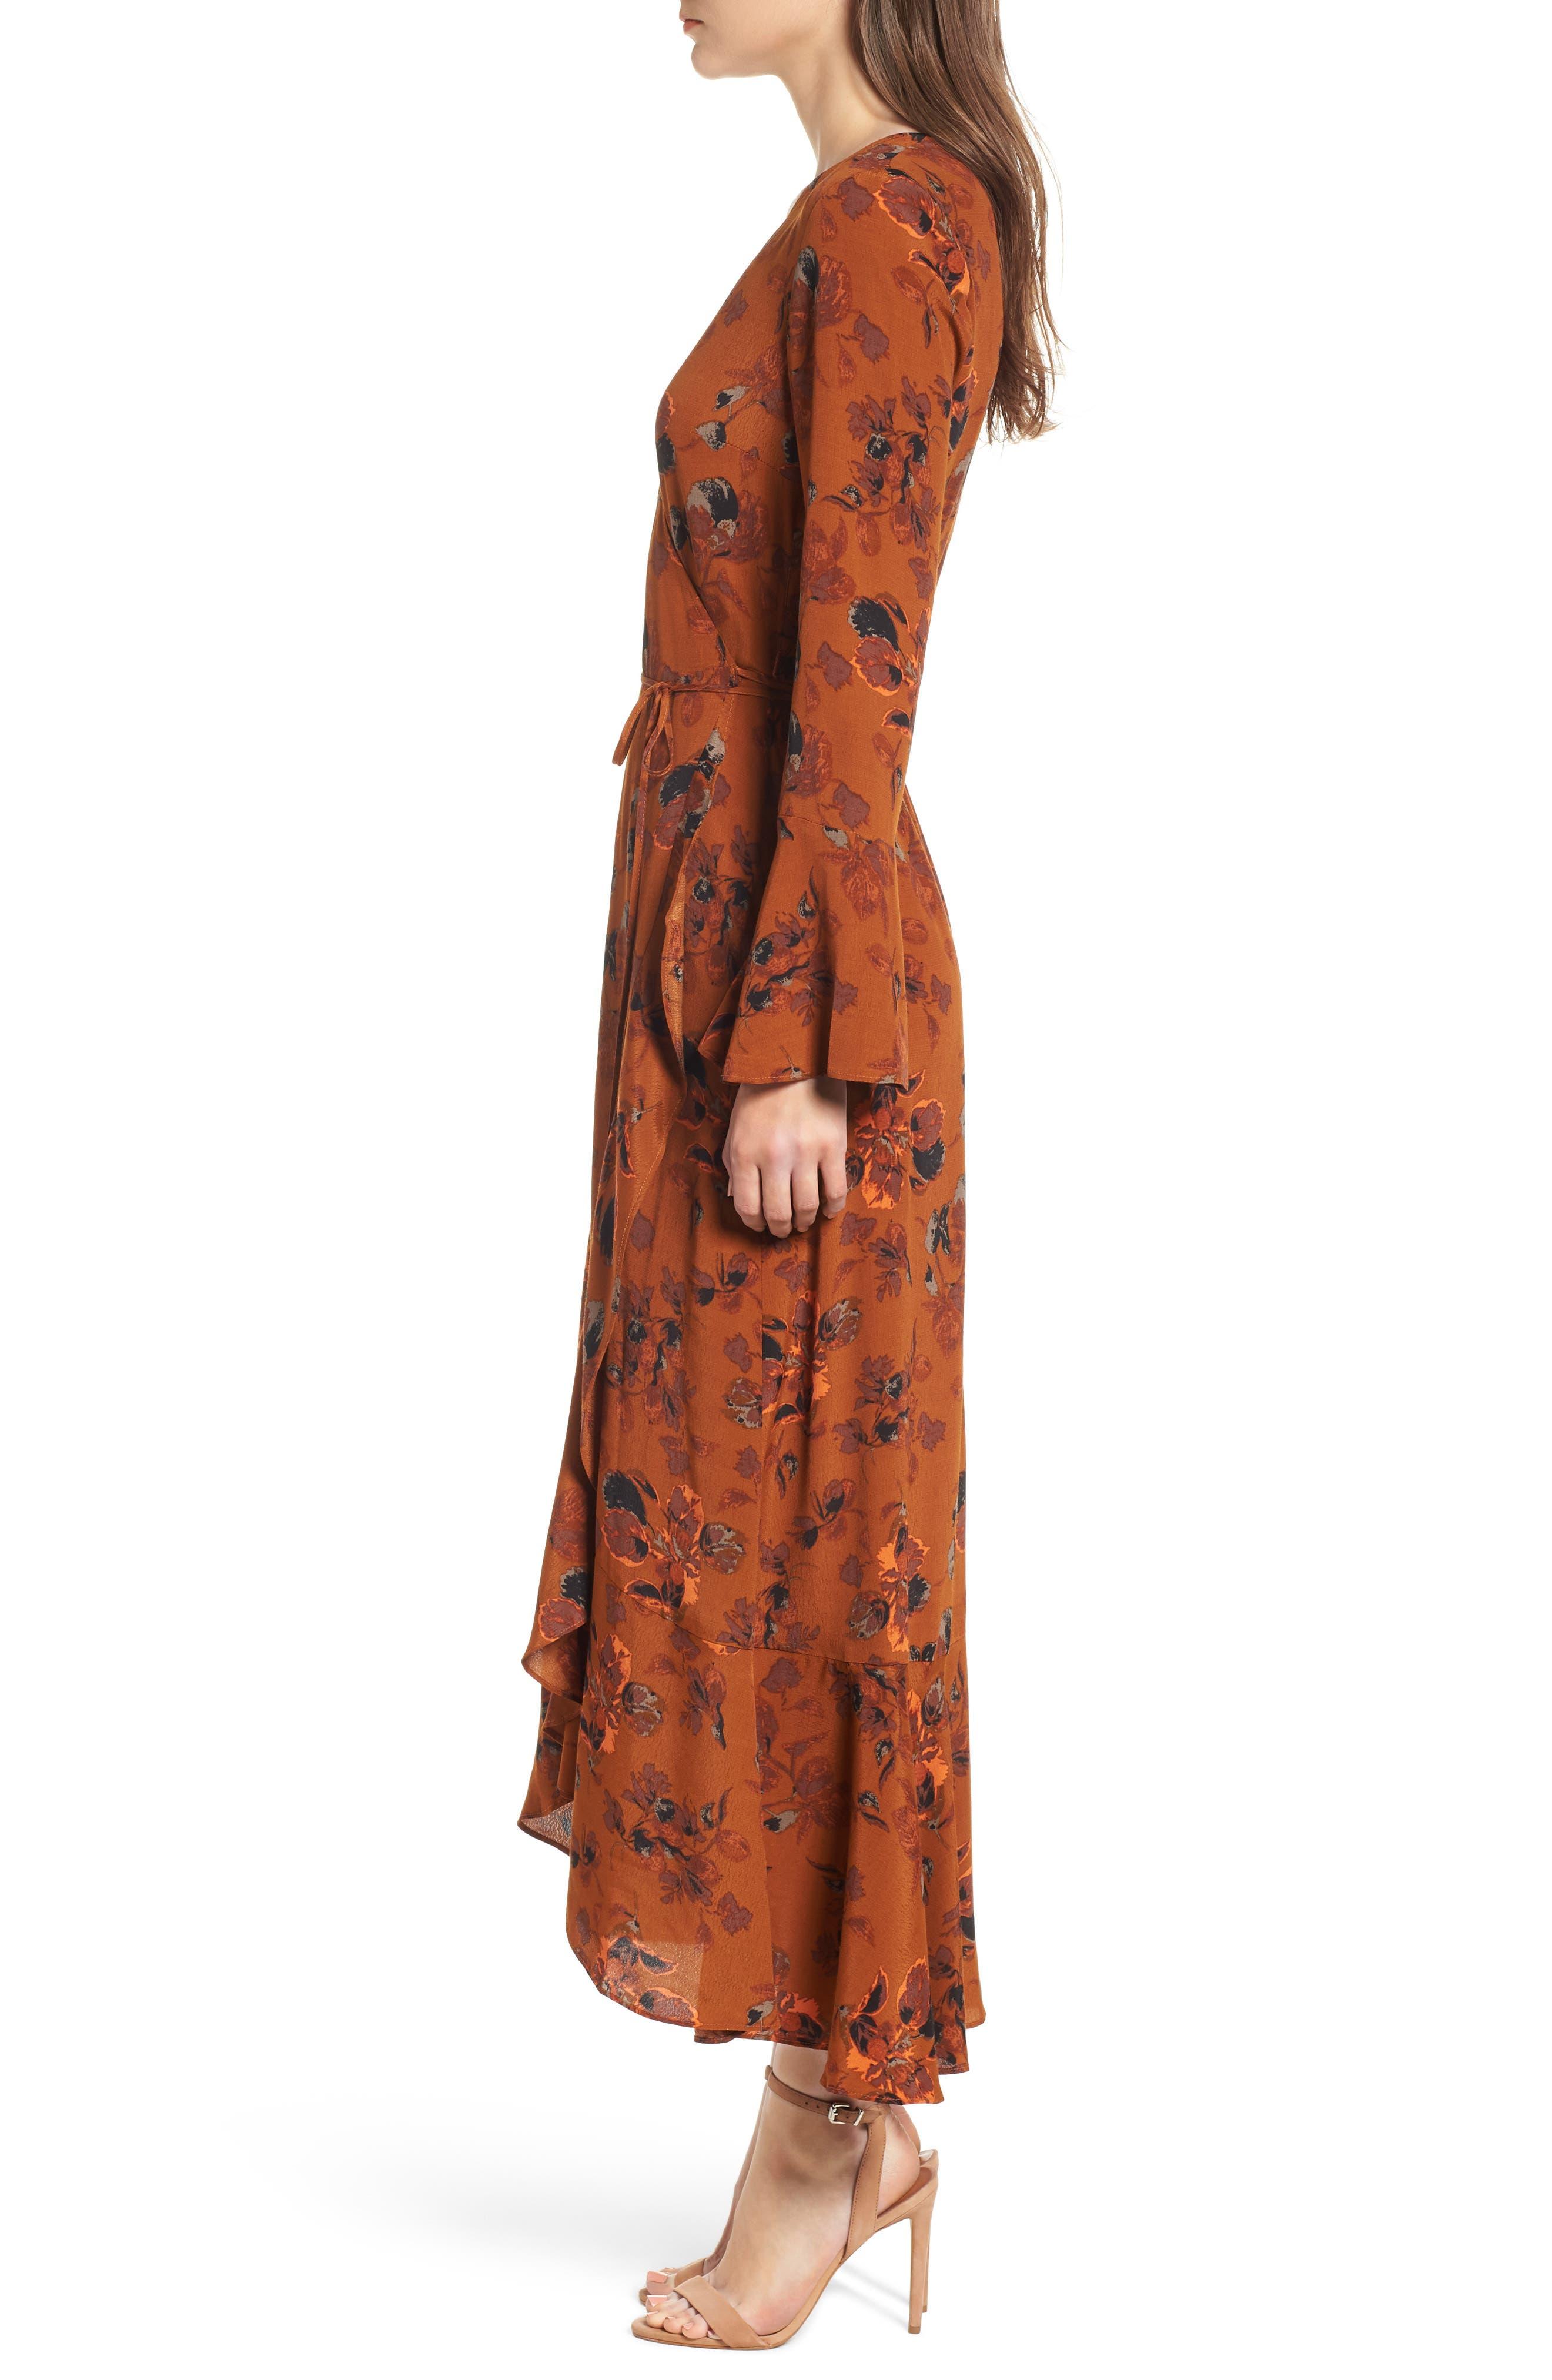 Bell Sleeve Wrap Midi Dress,                             Alternate thumbnail 3, color,                             RUST CARMEL FALL FOLIAGE